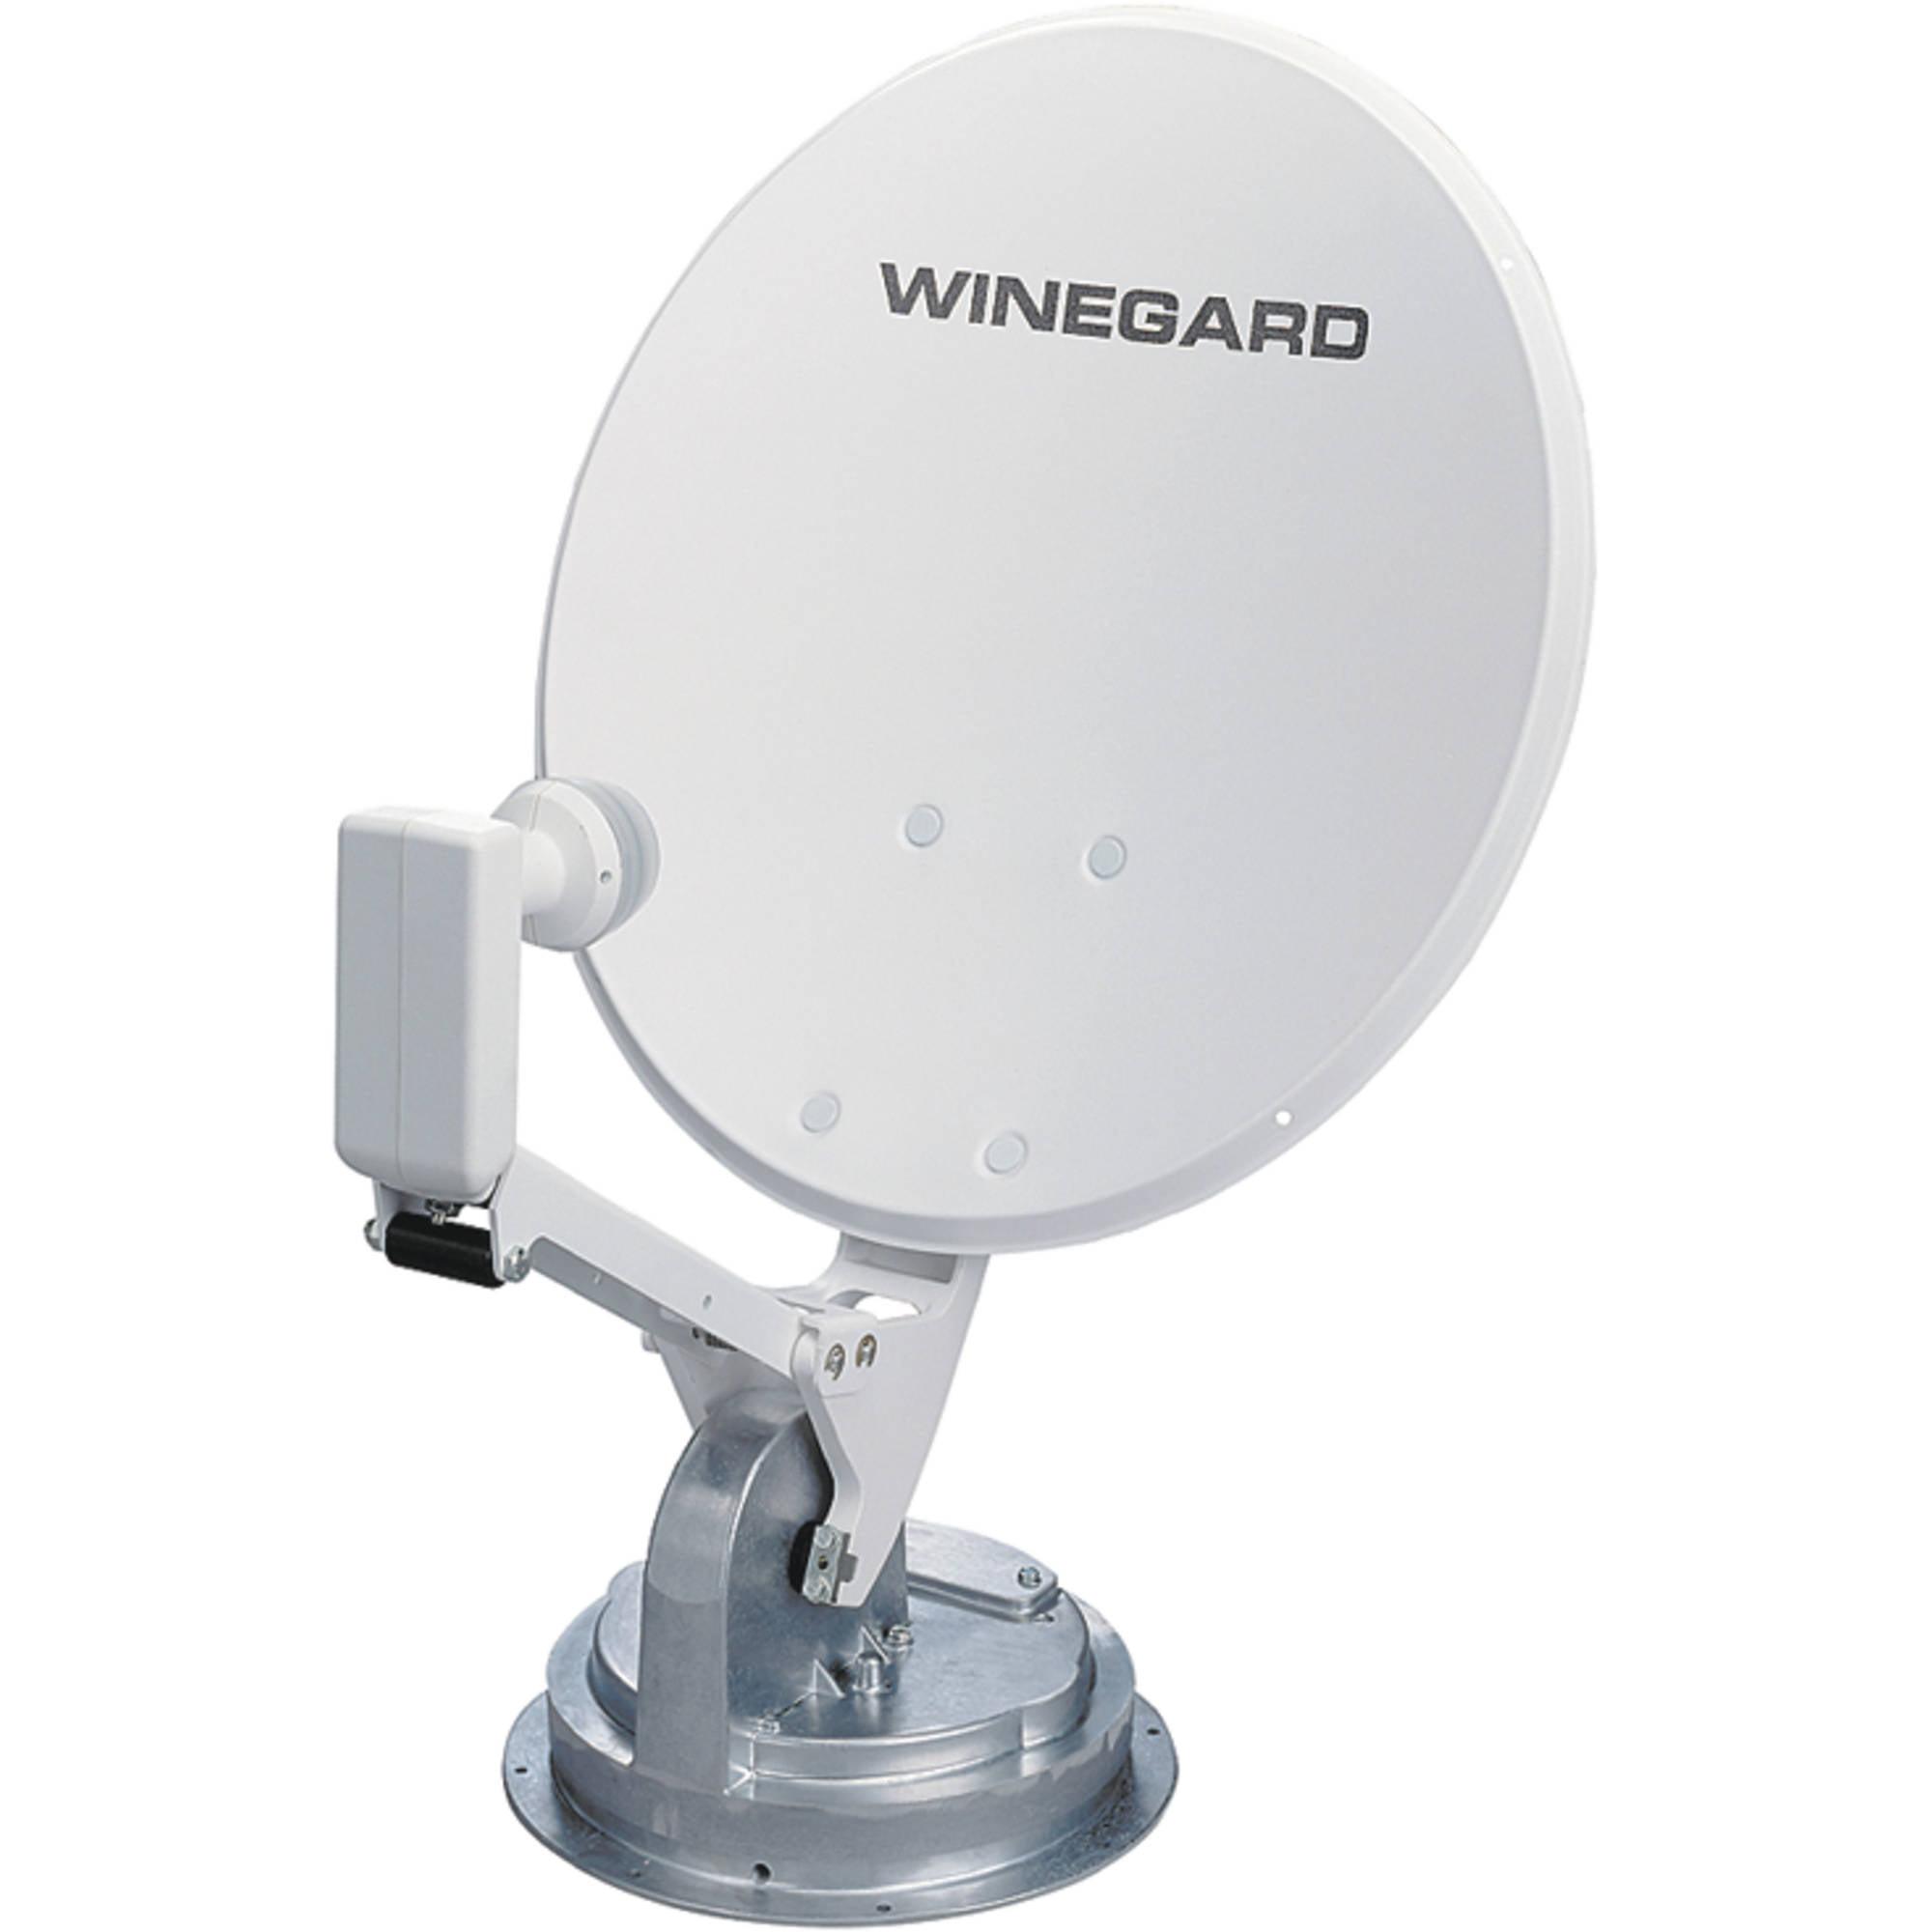 Winegard RM-DM46 Crank Up RV Satellite Antenna with DM Se...